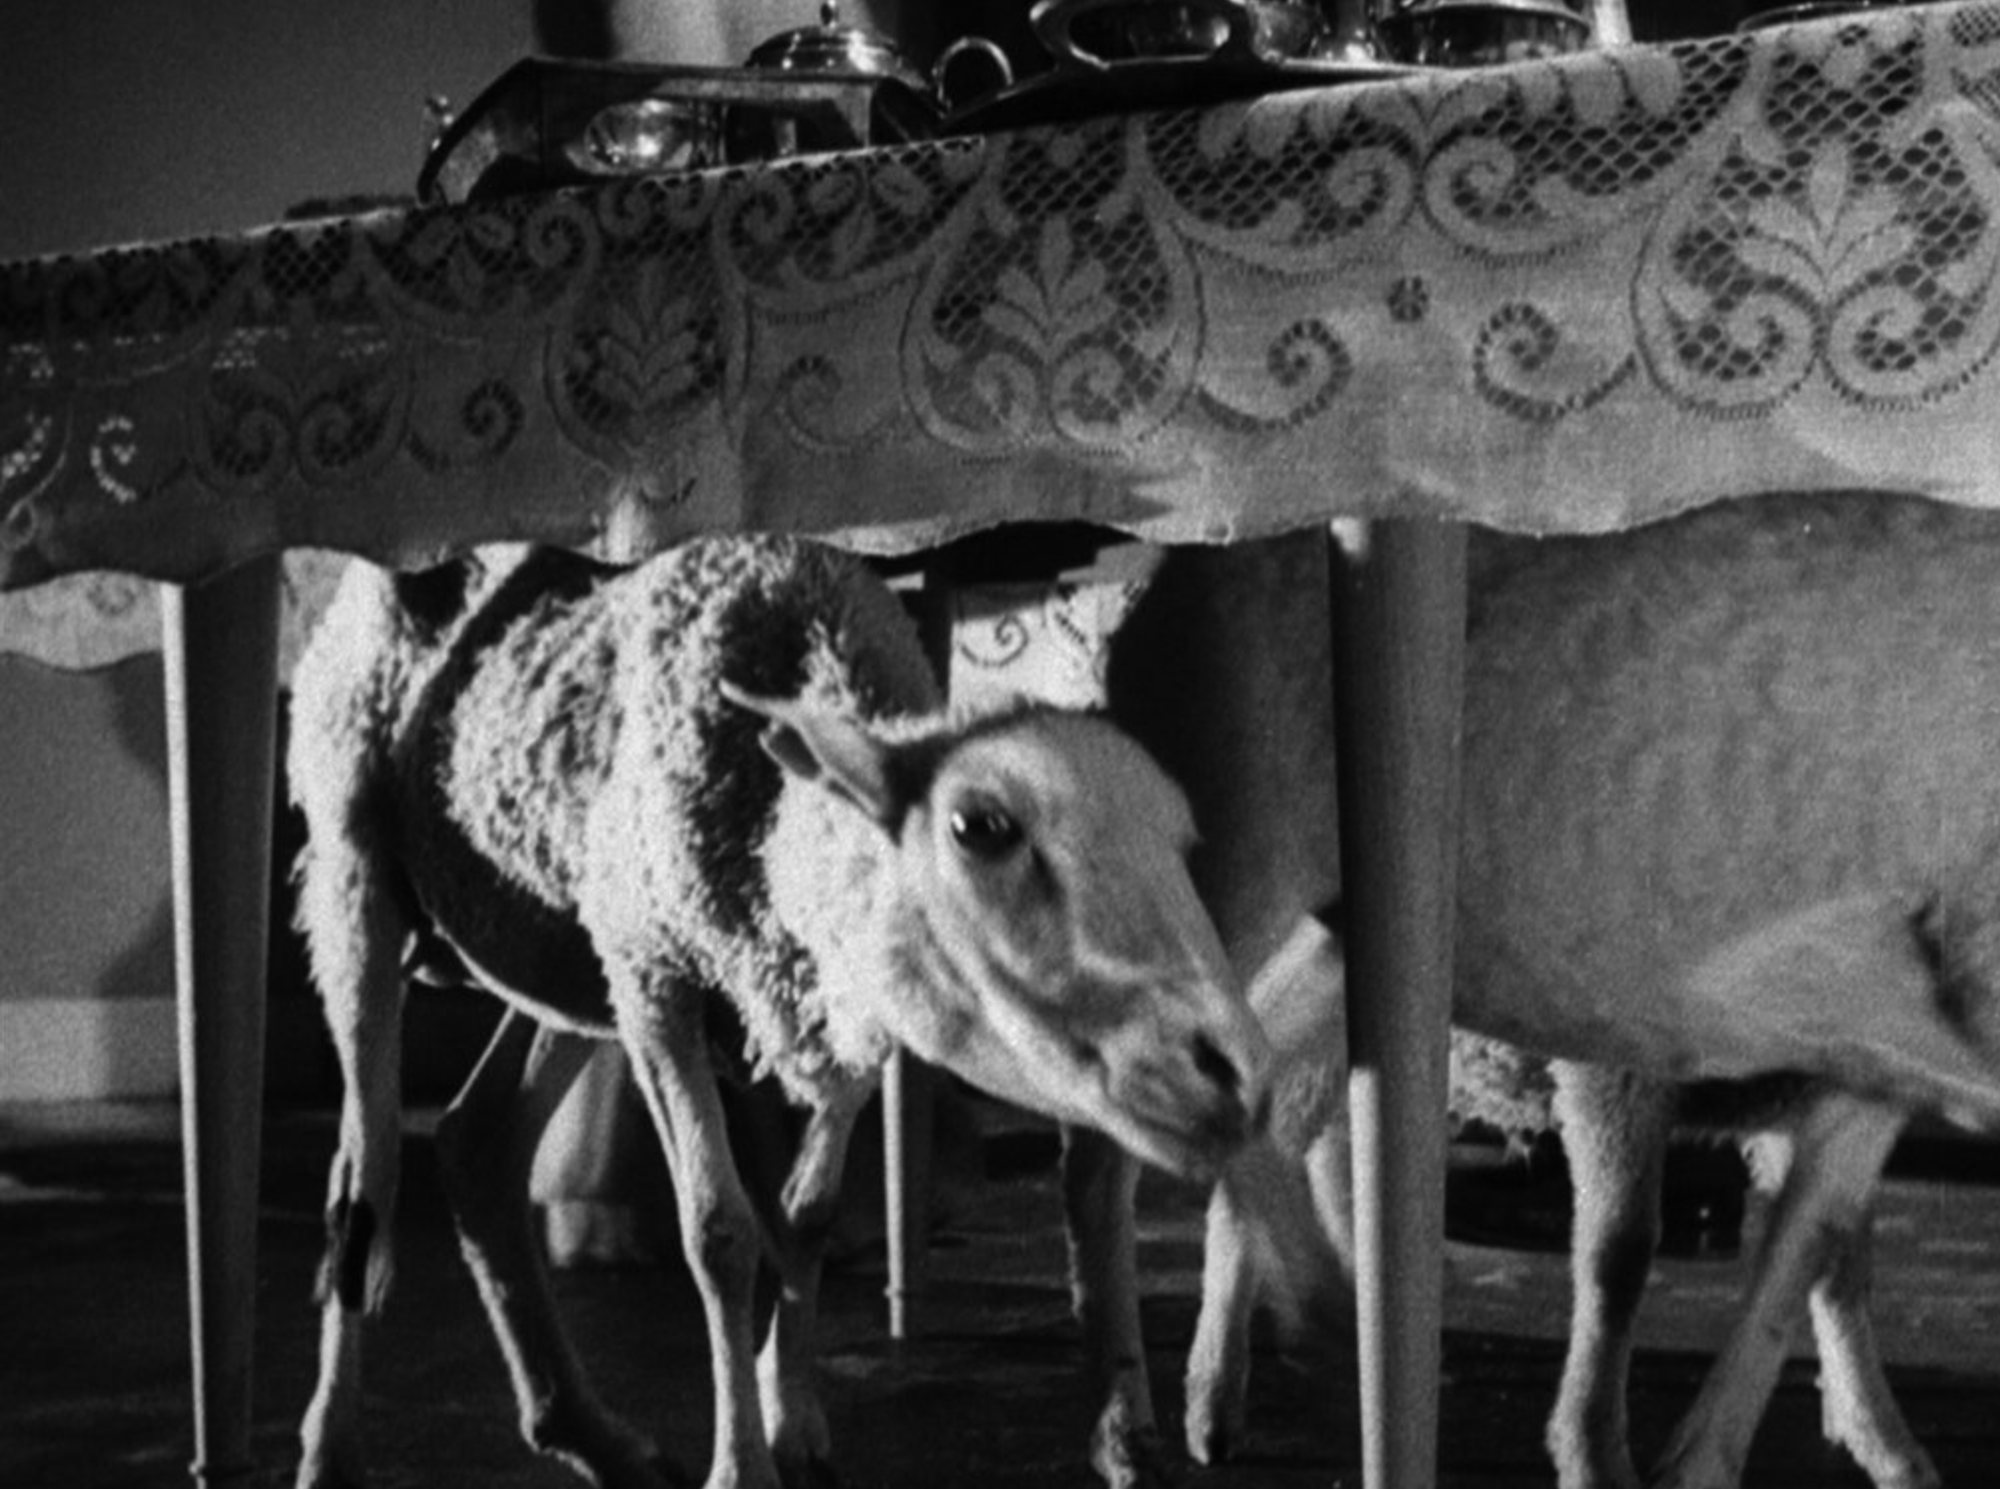 Luis Bunuel's  The    Exterminating Angel  (1962)